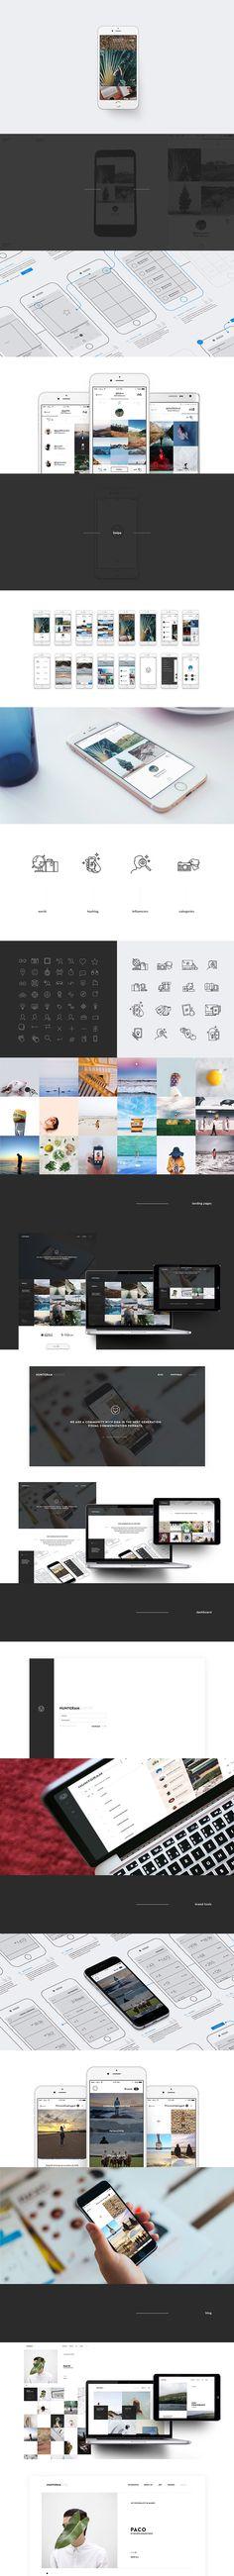 Huntgram App & Ecosystem designed by Donhkoland #Design #Digital #App #Brand #ProductDesign #Icons #Analitycs #Tools